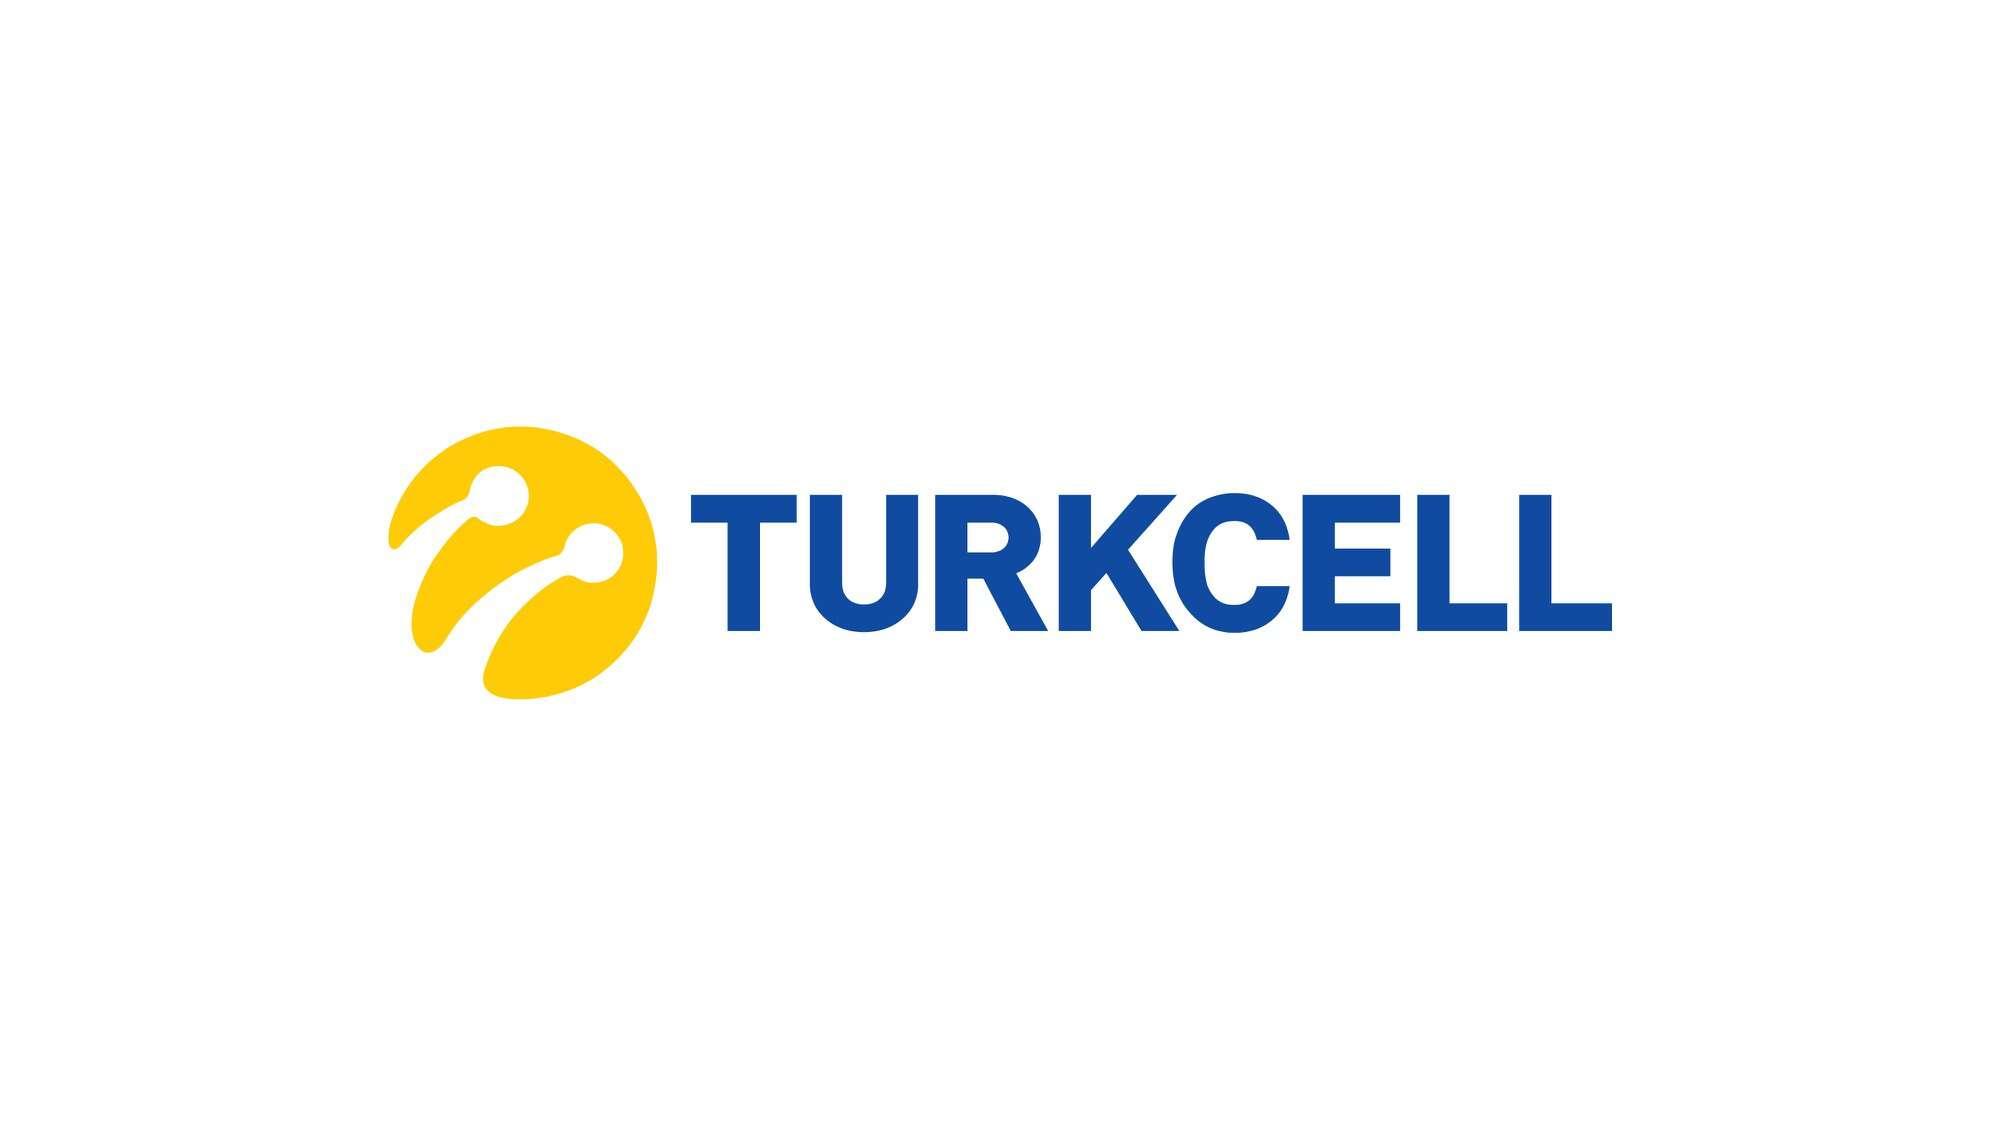 Turkcell Fatura Sorgulama